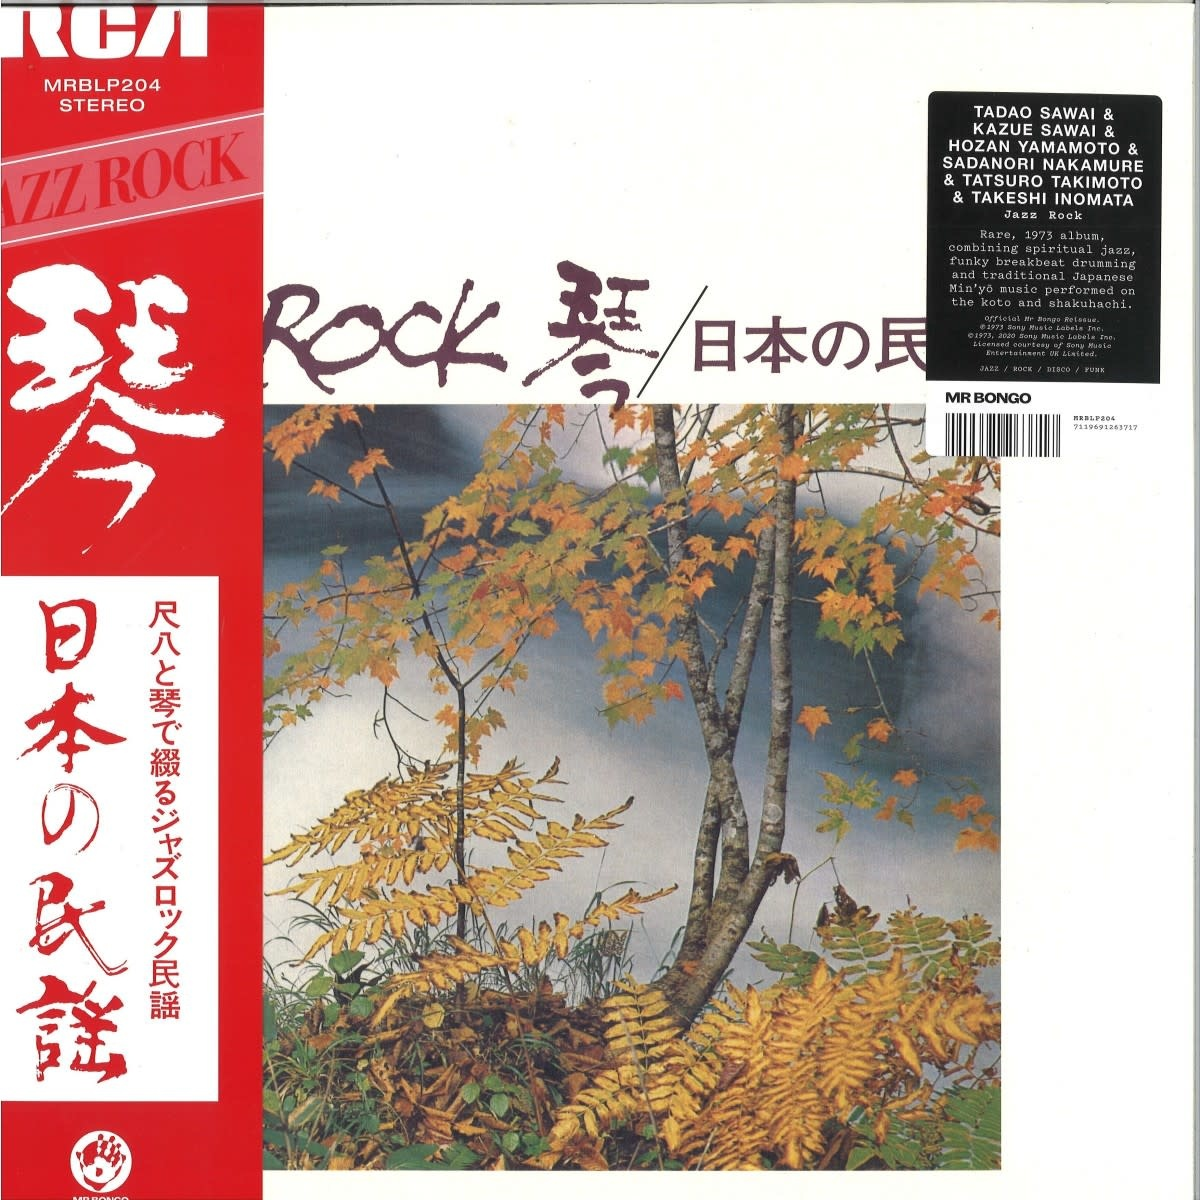 Sawai, Sawai, Yamamoto, Nakamure, Takimoto & Inomata • Jazz Rock-1